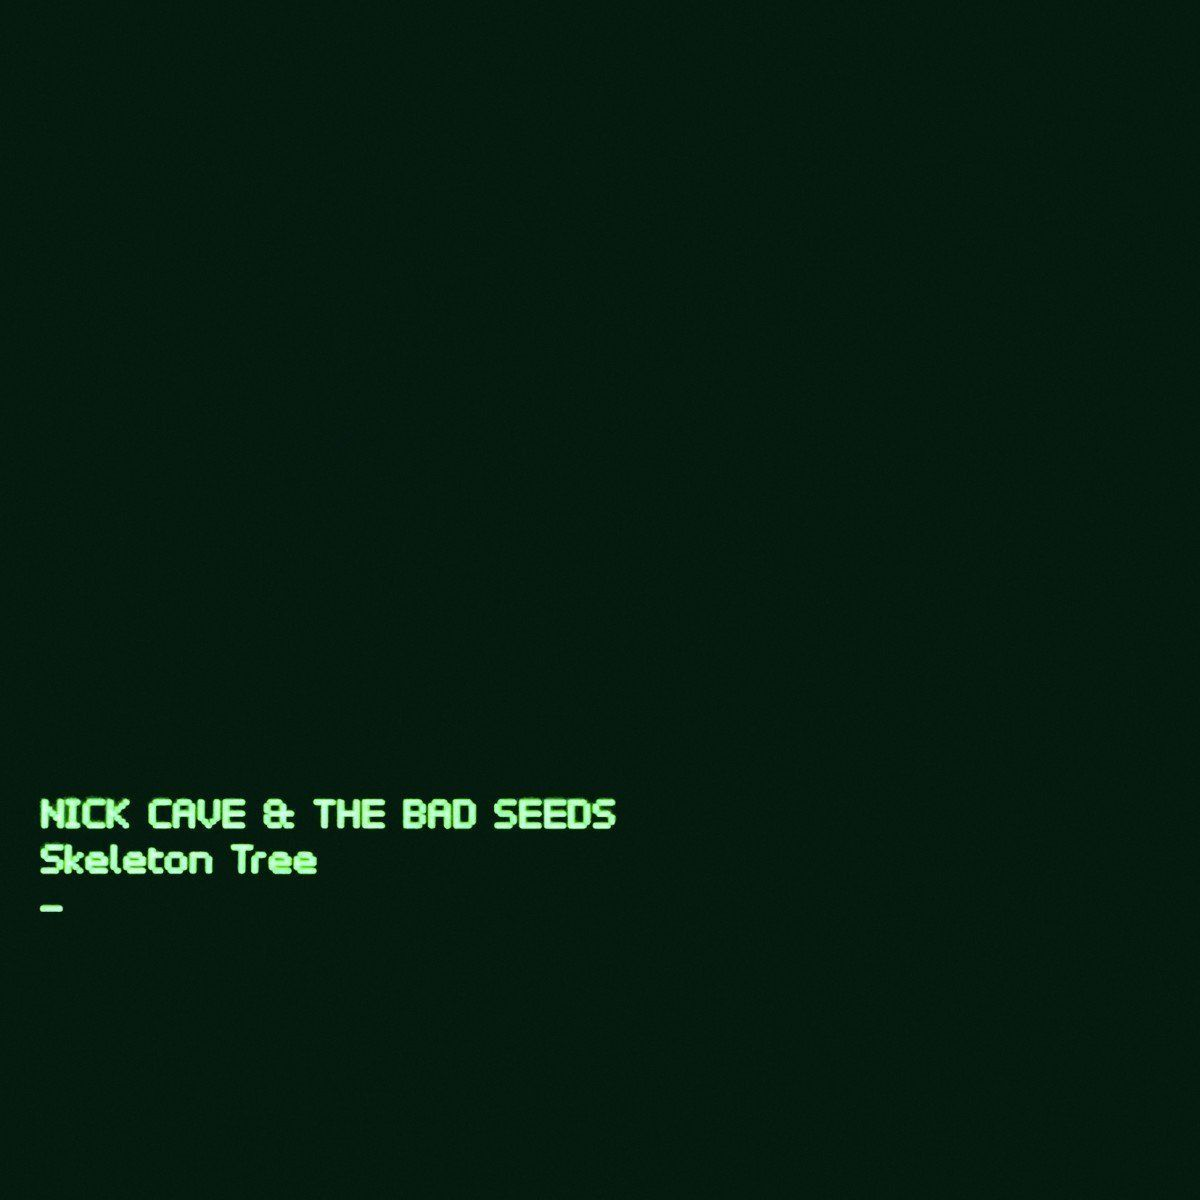 Nick Cave - Skeleton Tree album cover